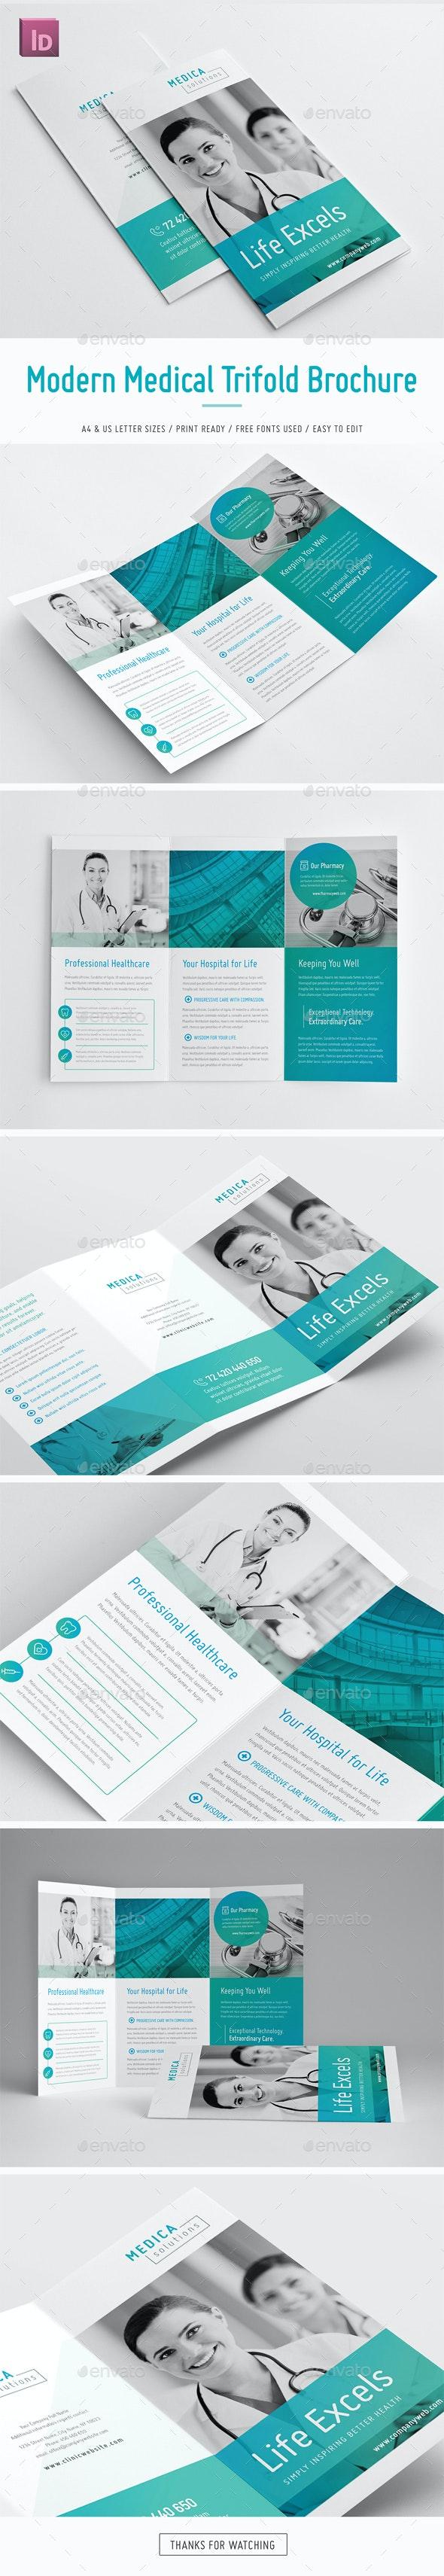 Modern Medical Trifold Brochure - Brochures Print Templates